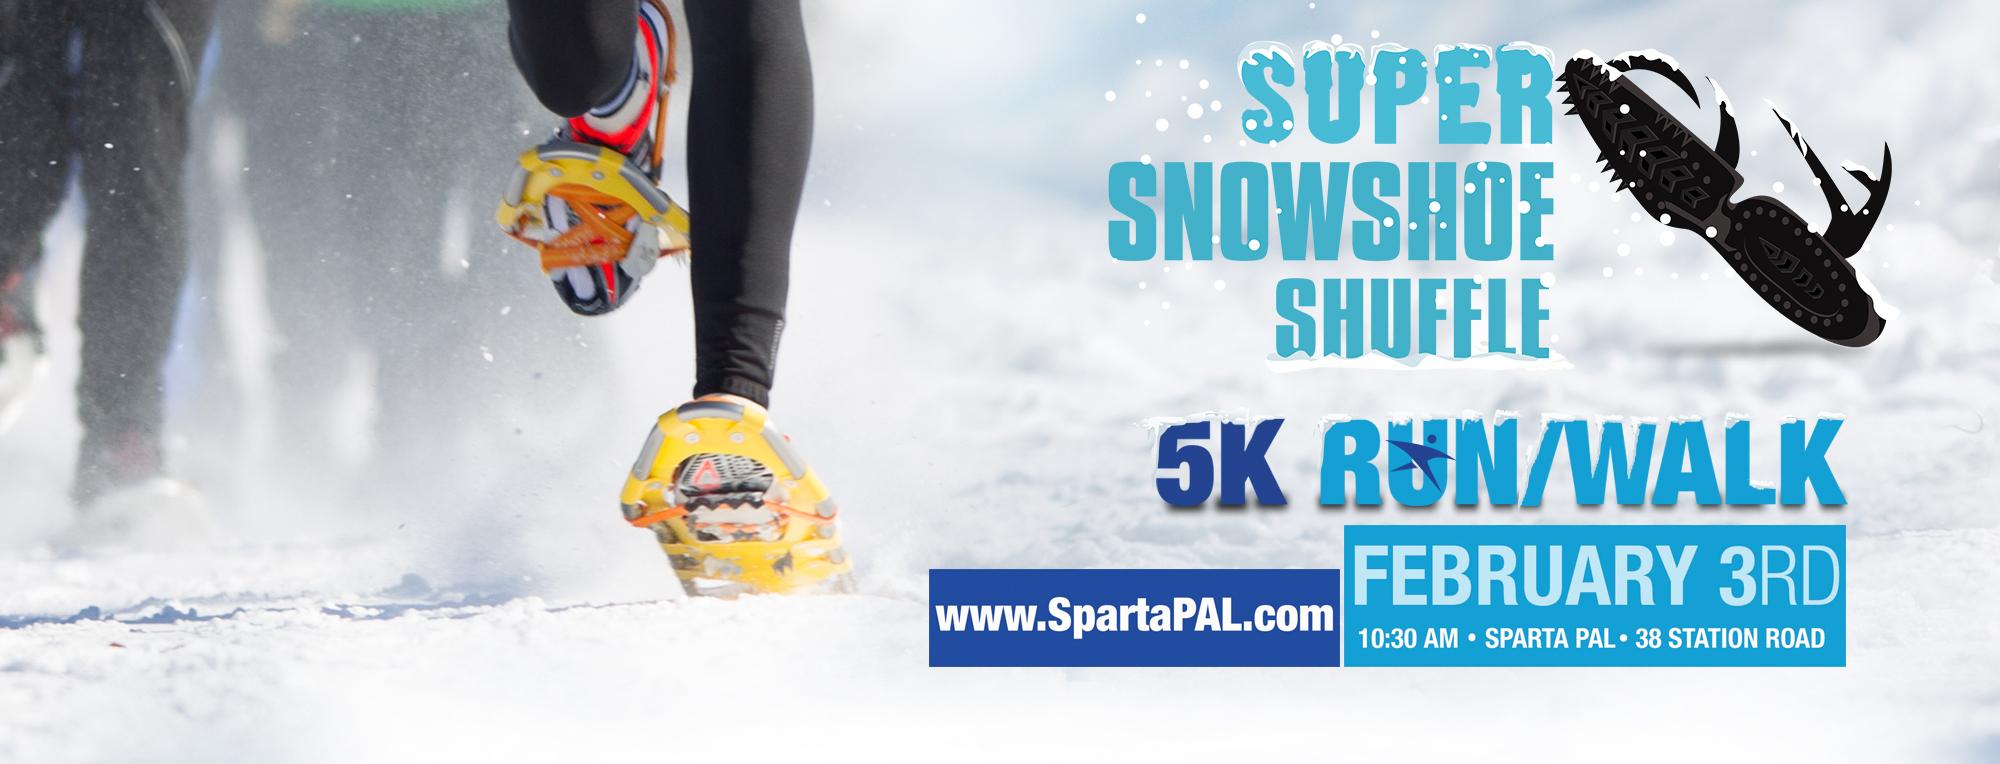 snowshoe-2018-banner-events.jpg